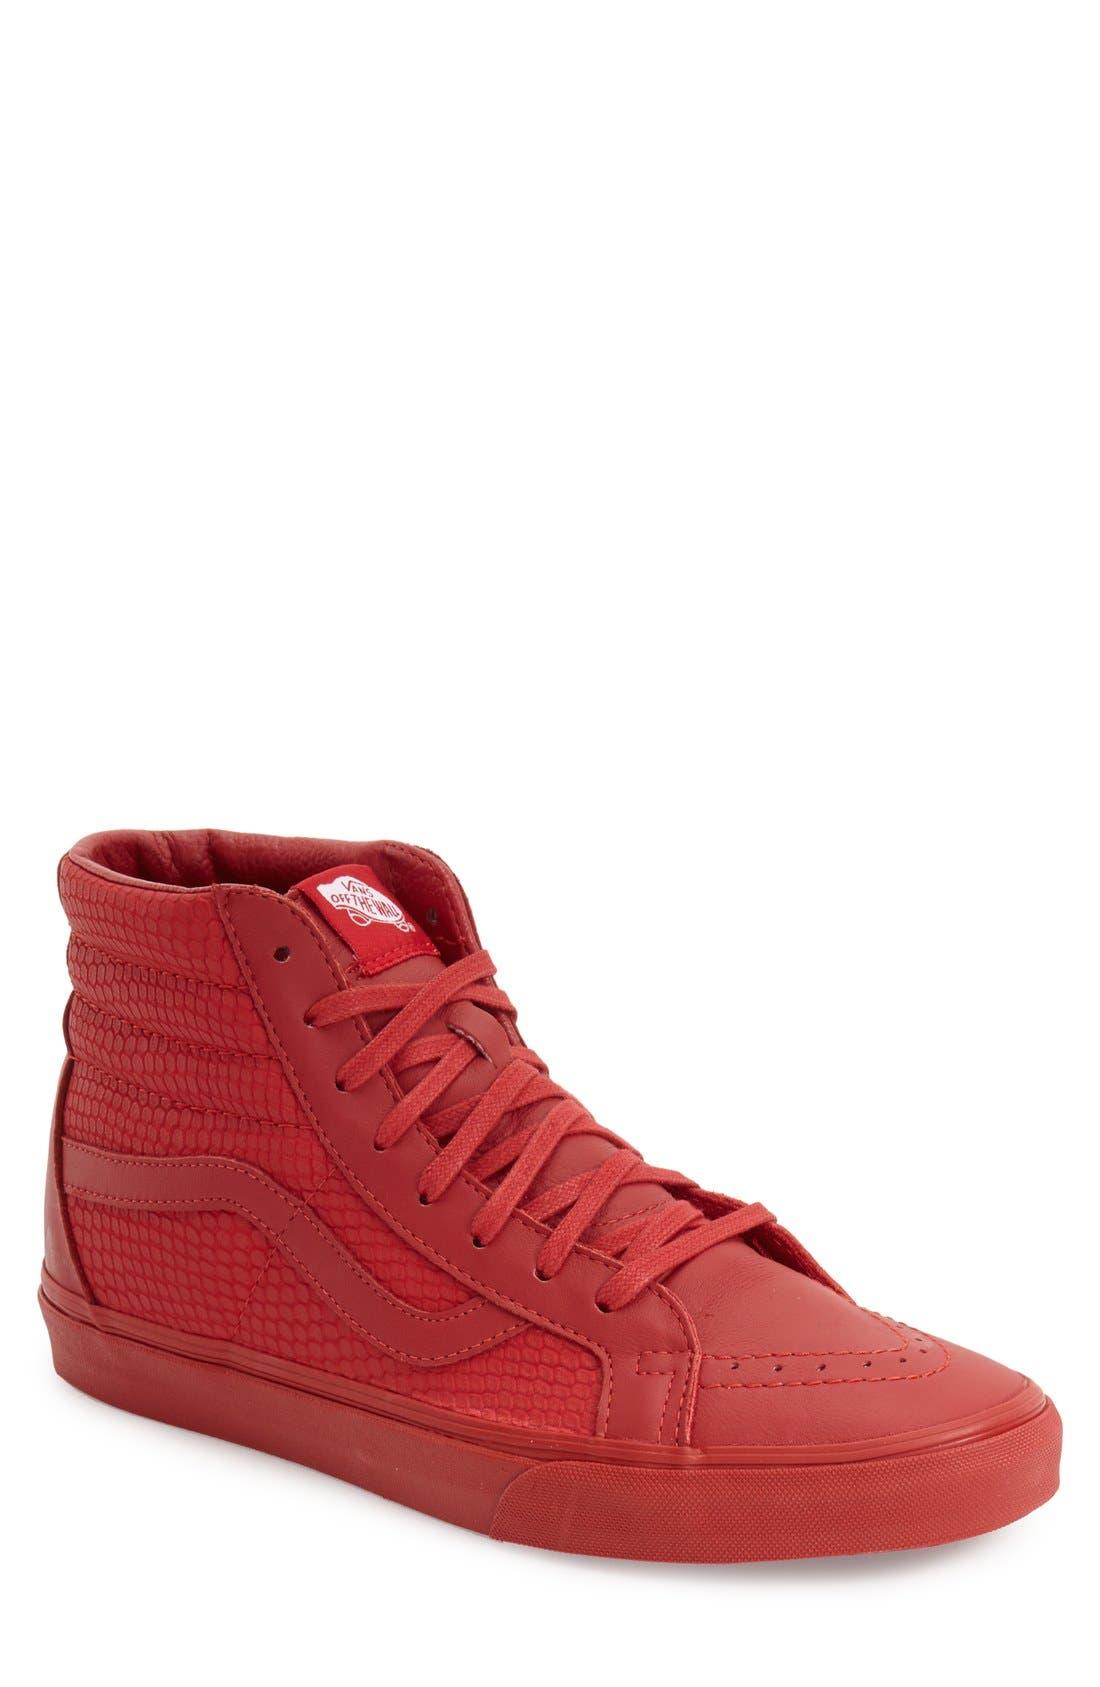 Alternate Image 1 Selected - Vans 'Sk8-Hi Reissue Plus' Sneaker (Men)